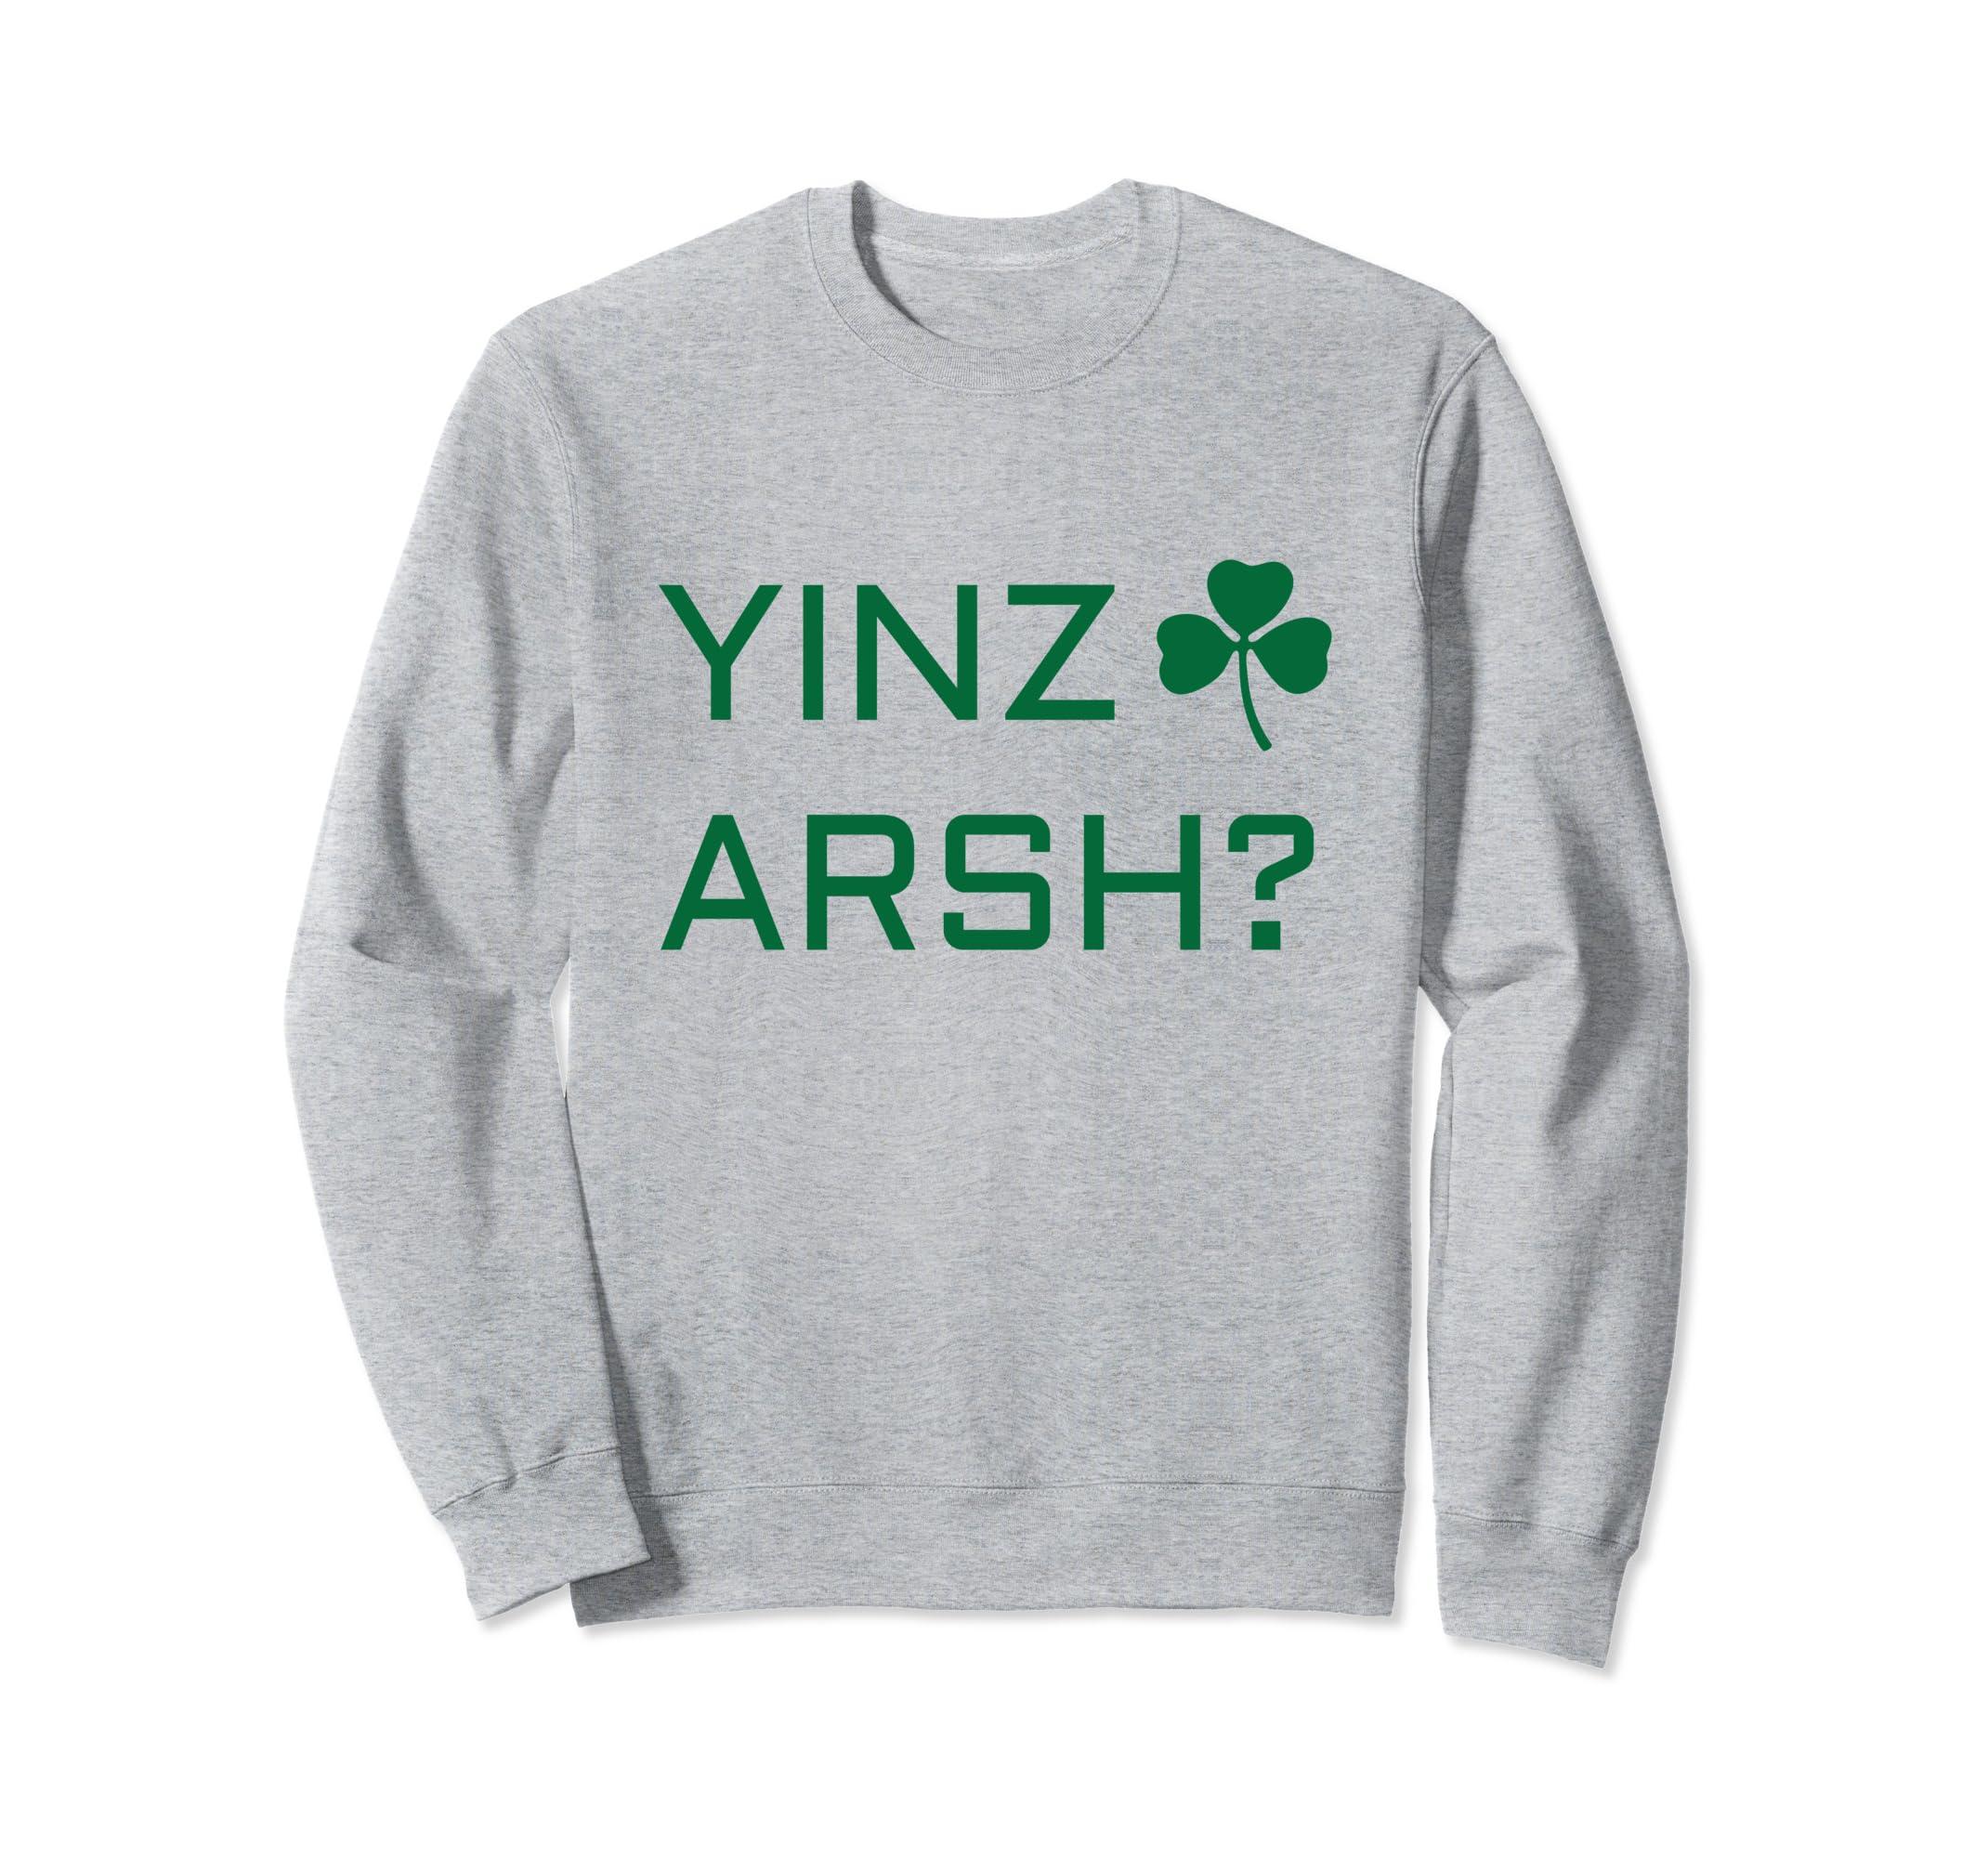 Pittsburgh Irish Sweatshirt – Irish Yinzer Yinz Arsh? Shirt-Teehay